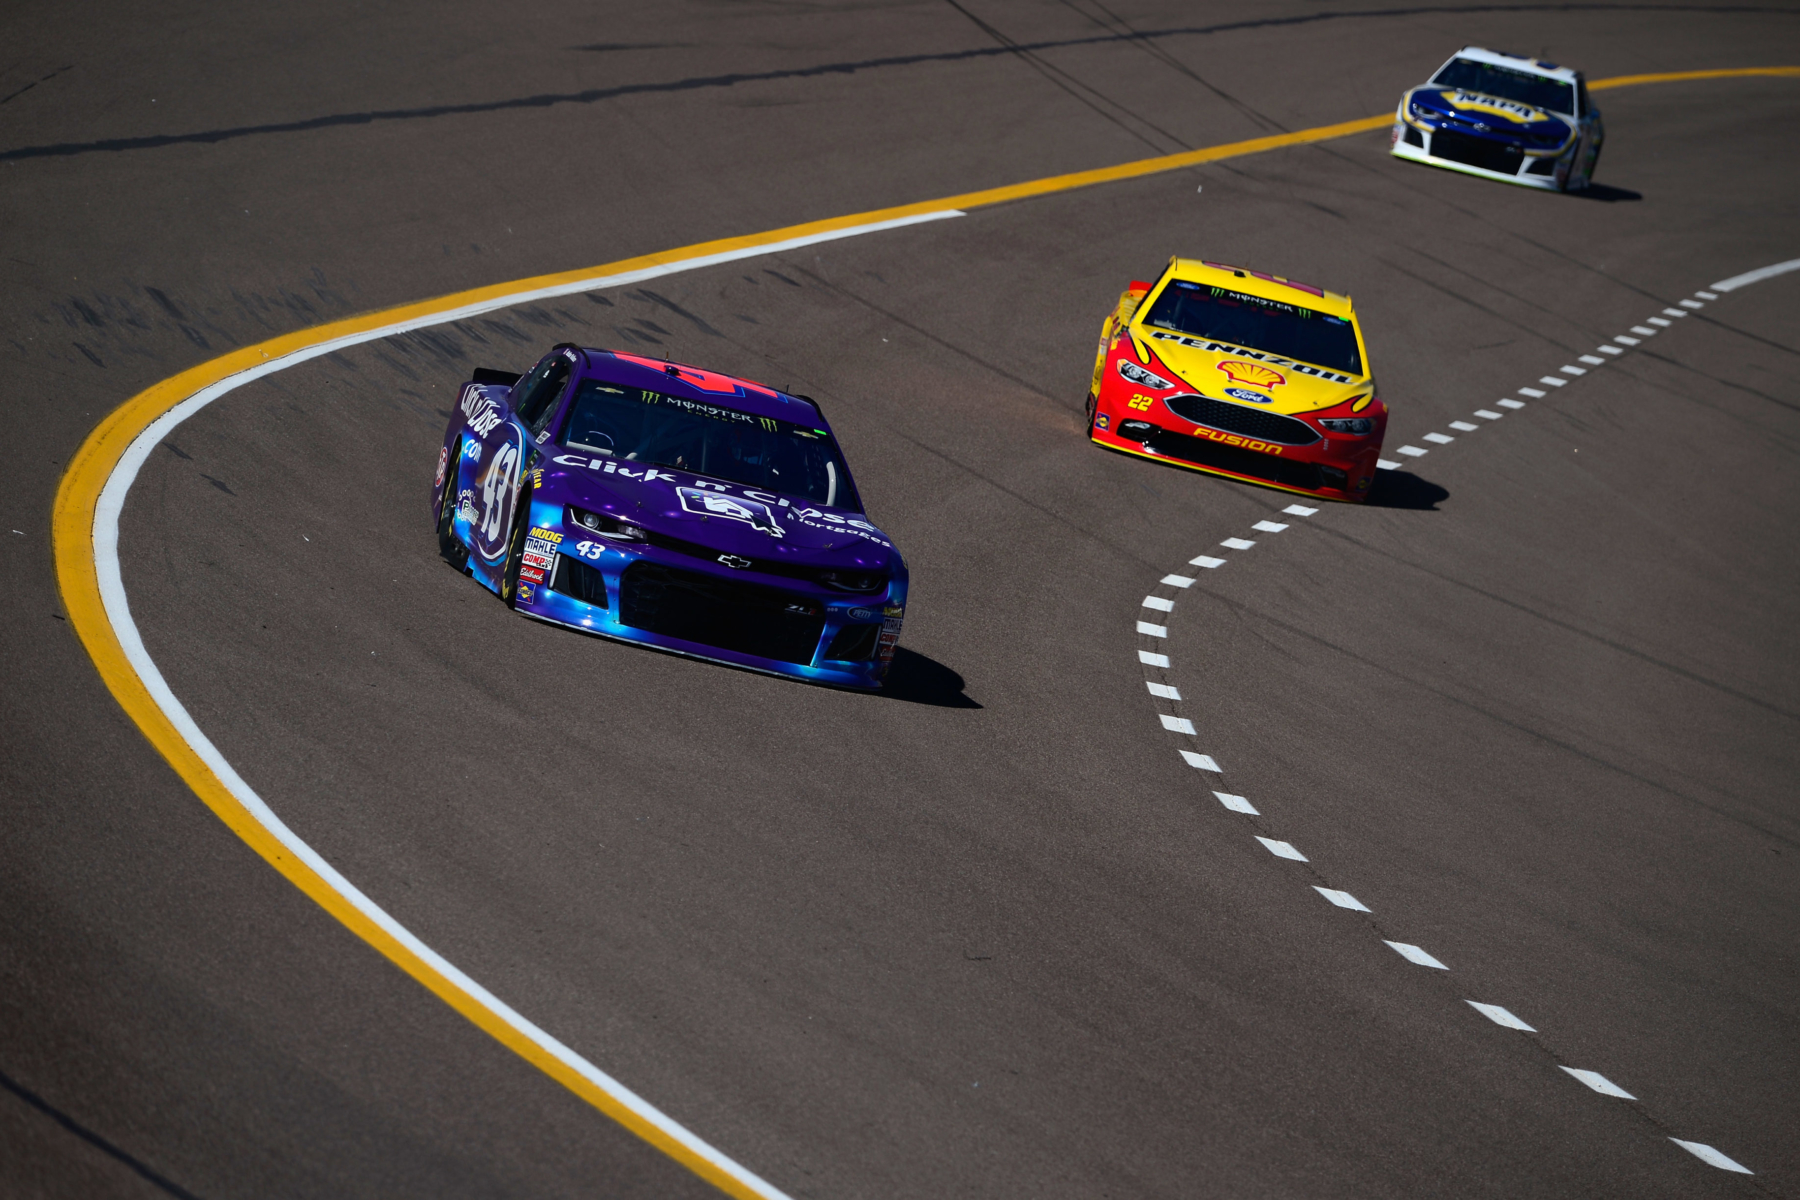 ISM Raceway dogleg photo - Darrell Wallace Jr and Joey Logano